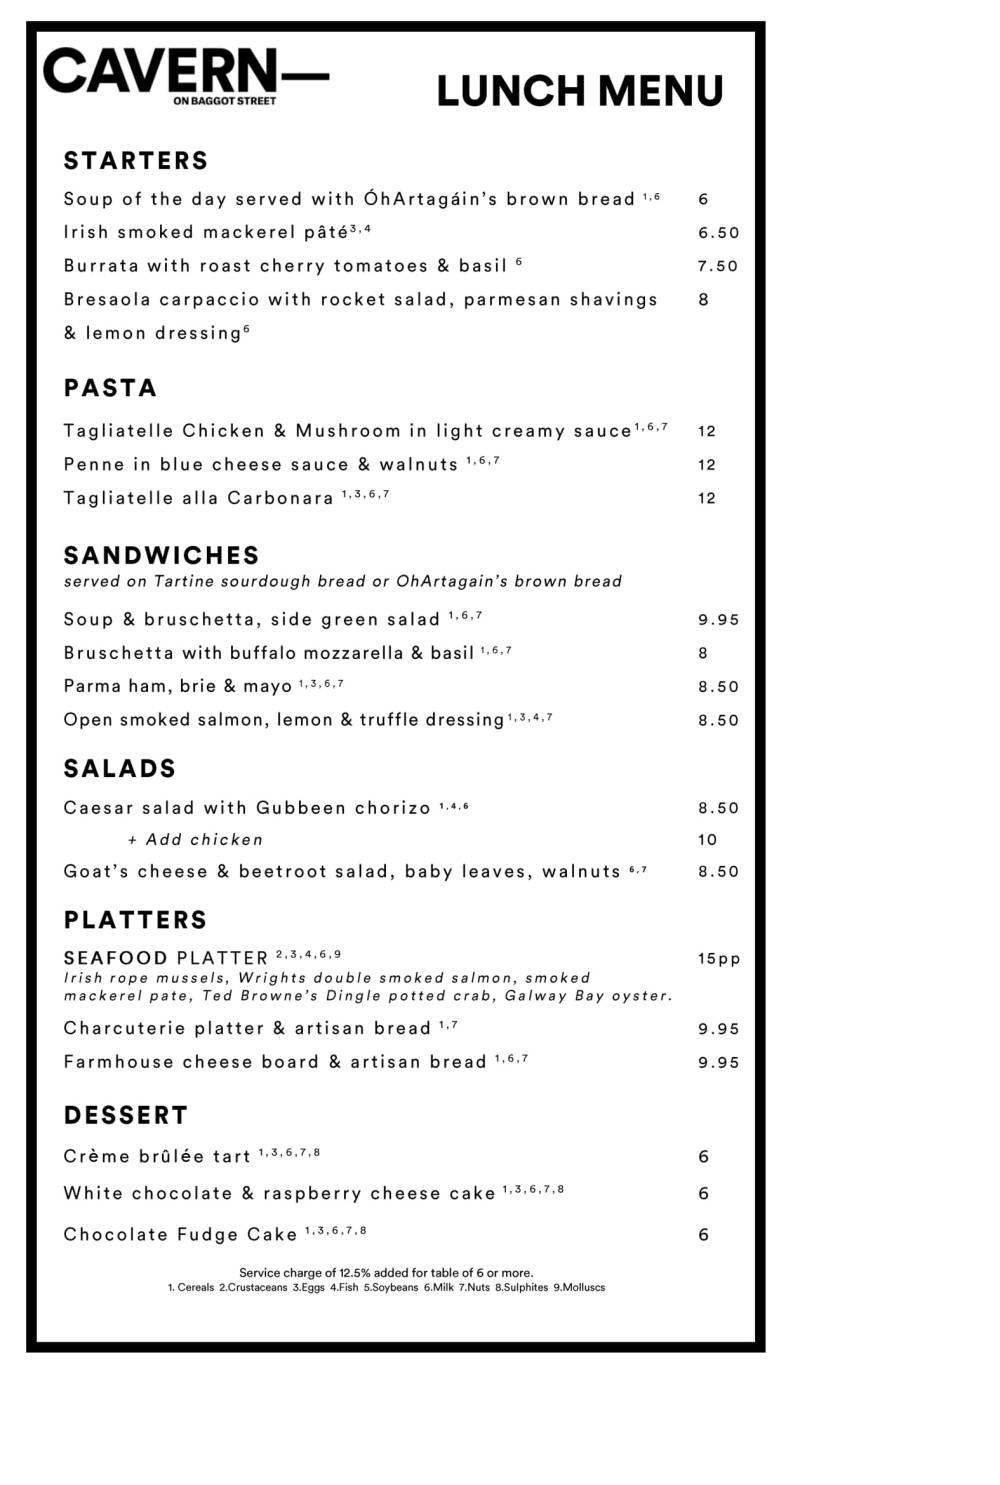 Lunch menu A5 october 2017 new-1.jpg